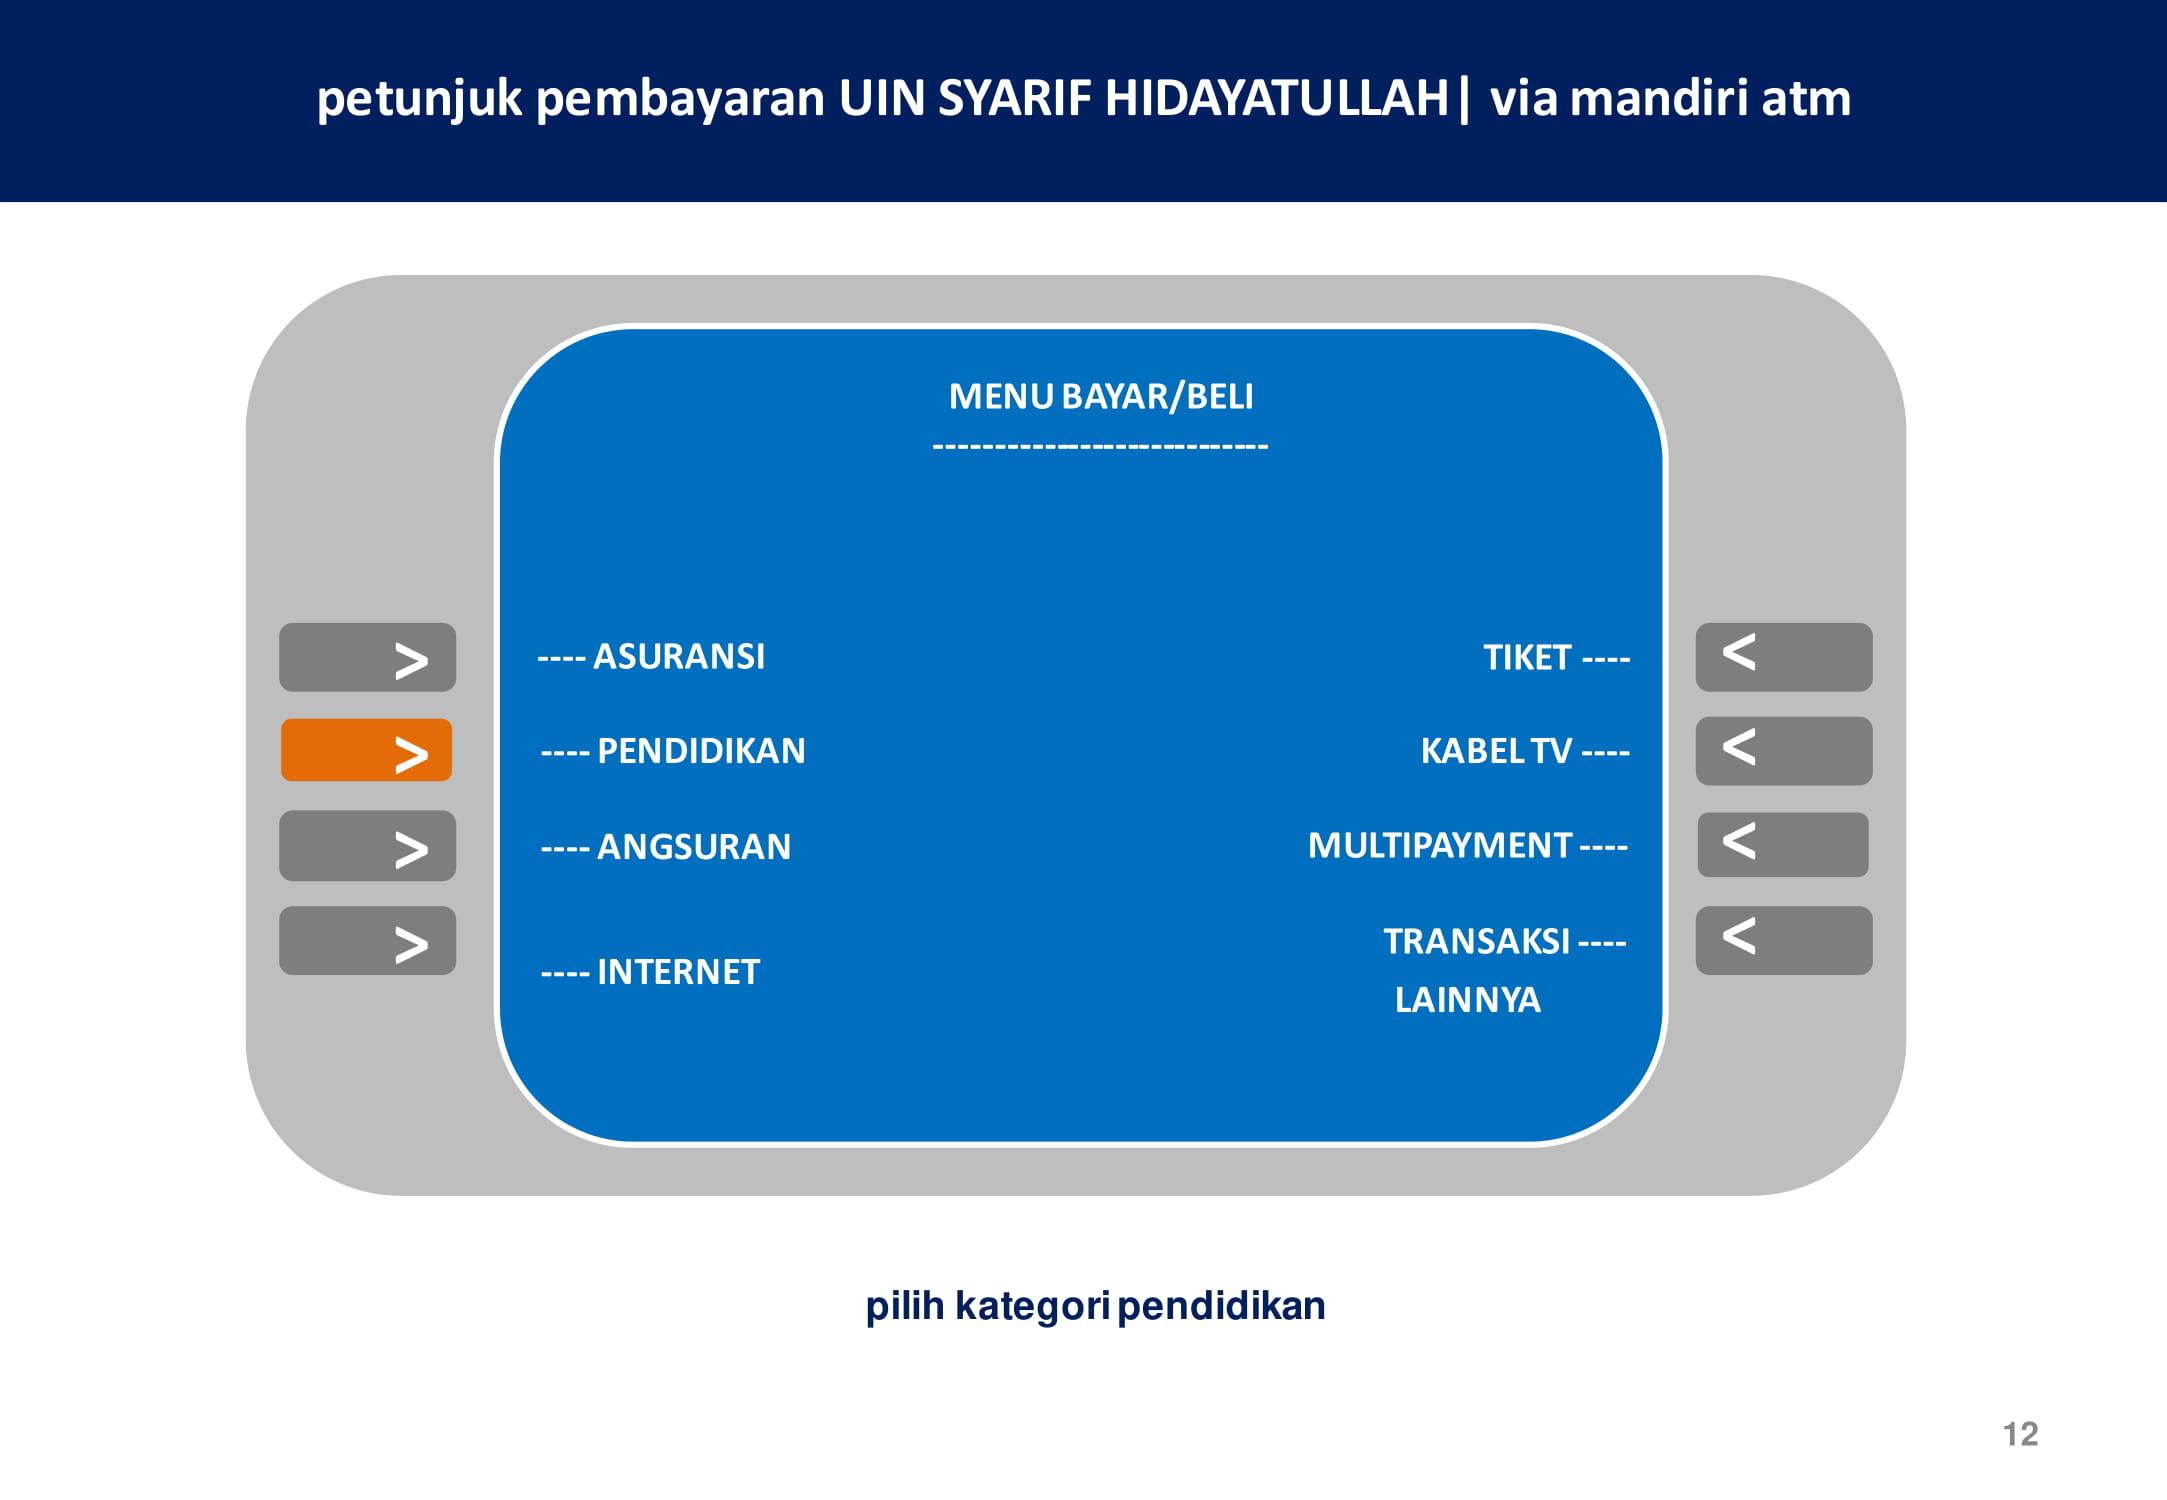 mandiri_atm_step3